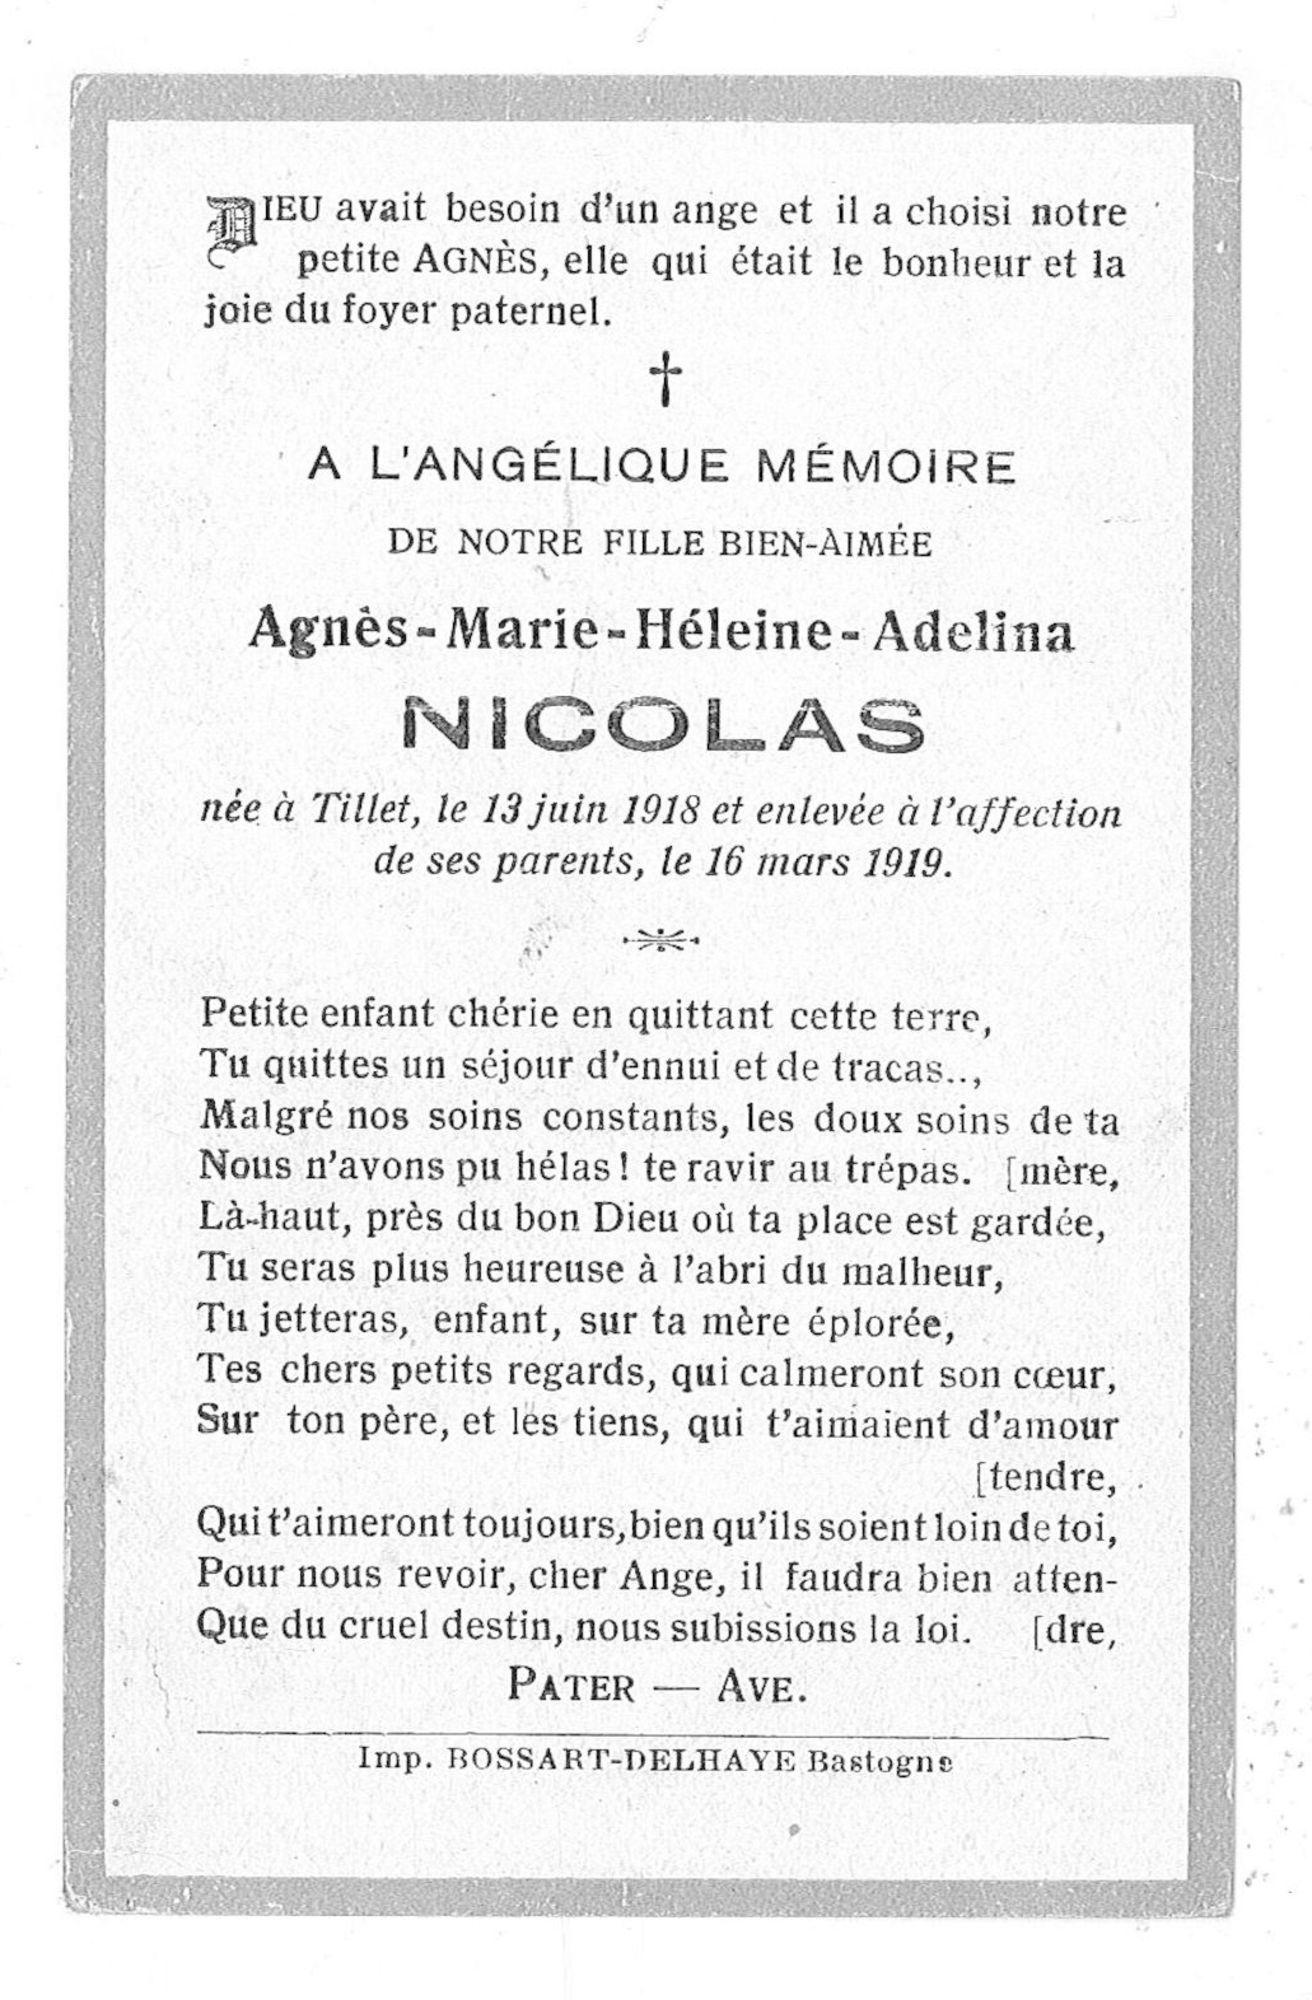 Agnès-Marie-Héleine-Adelina Nicolas